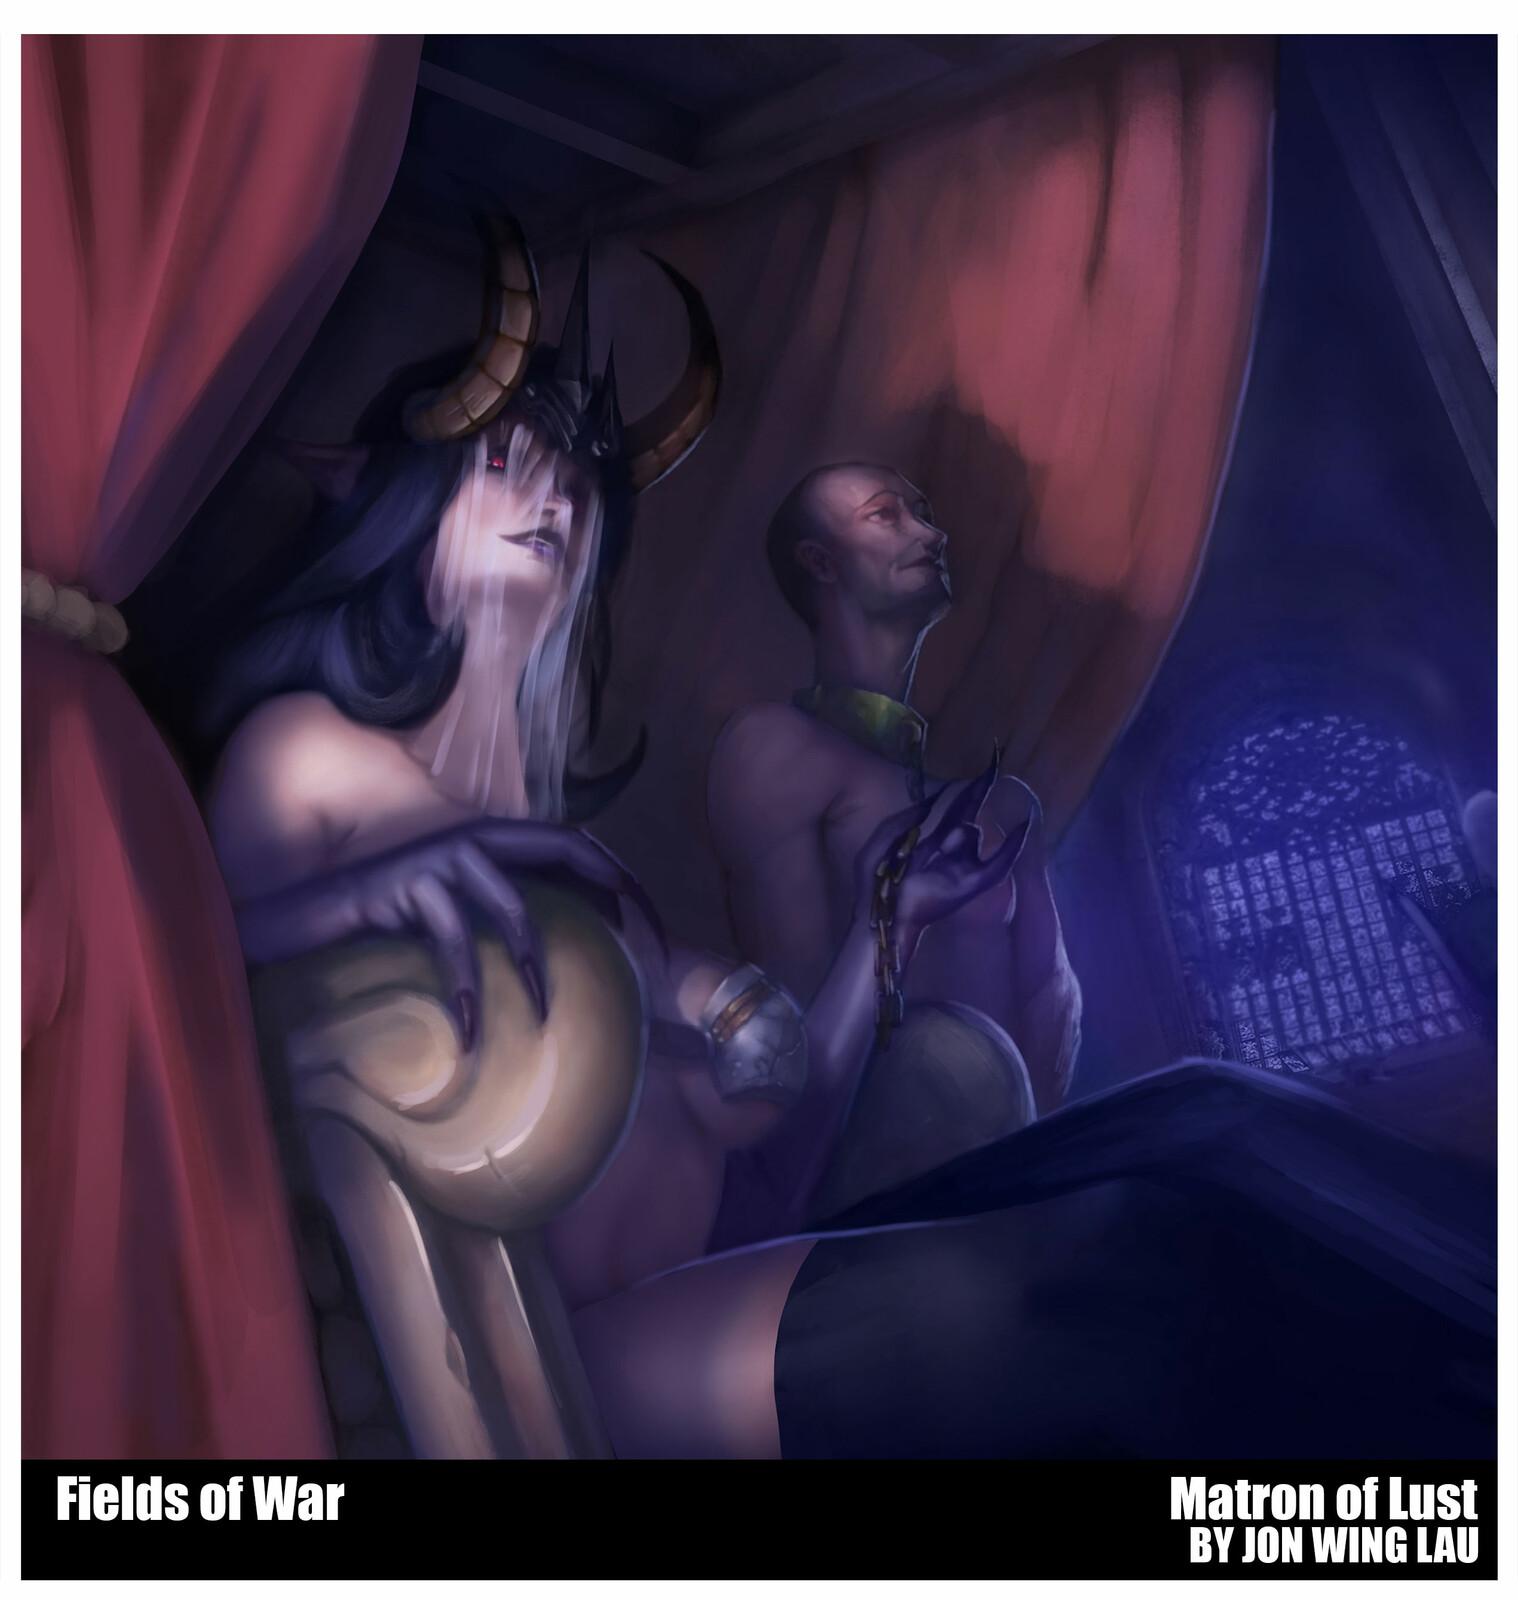 Matron of Lust